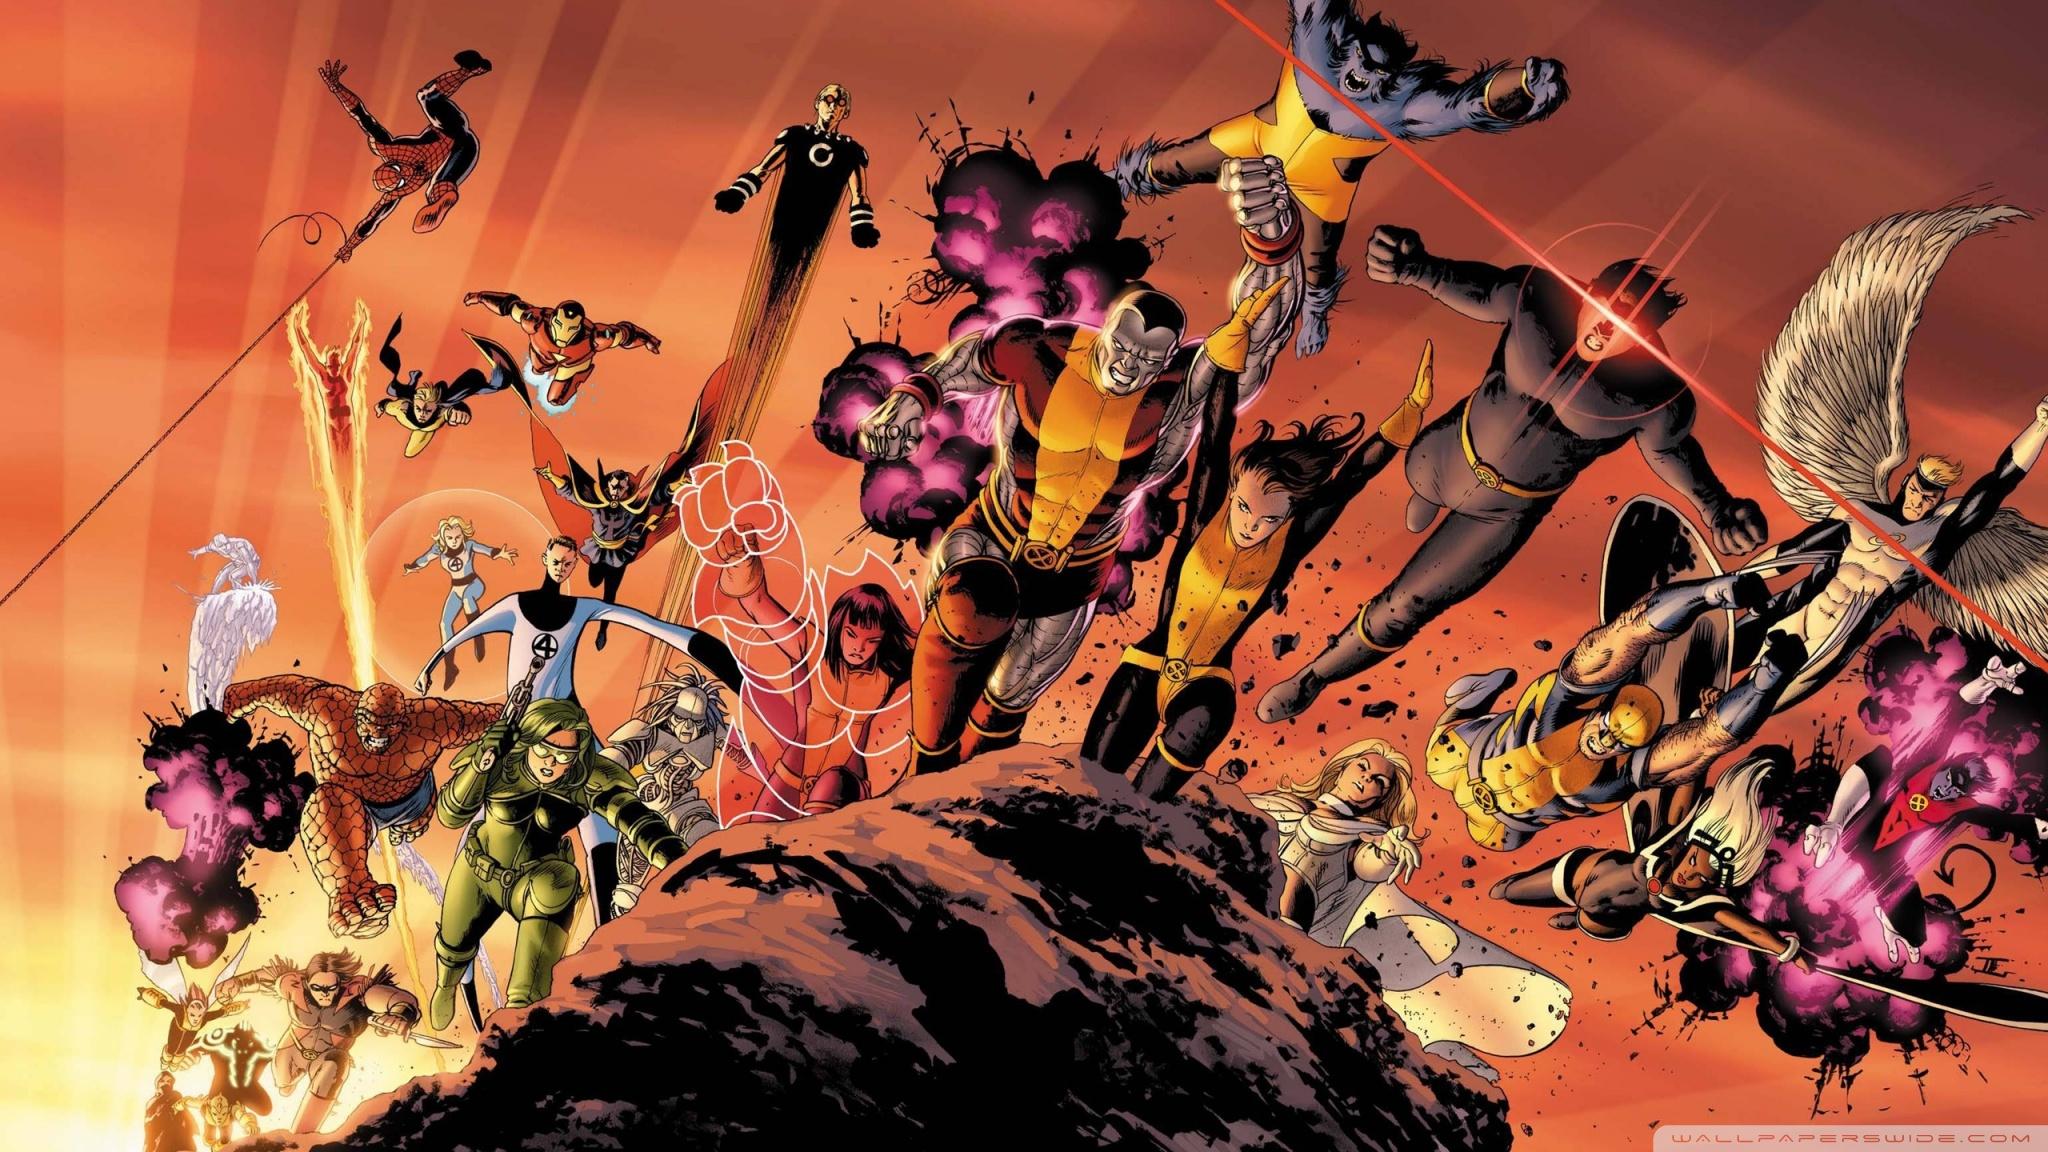 Superheroes Cartoons HD desktop    High Definition   Mobile HD Wallpaper